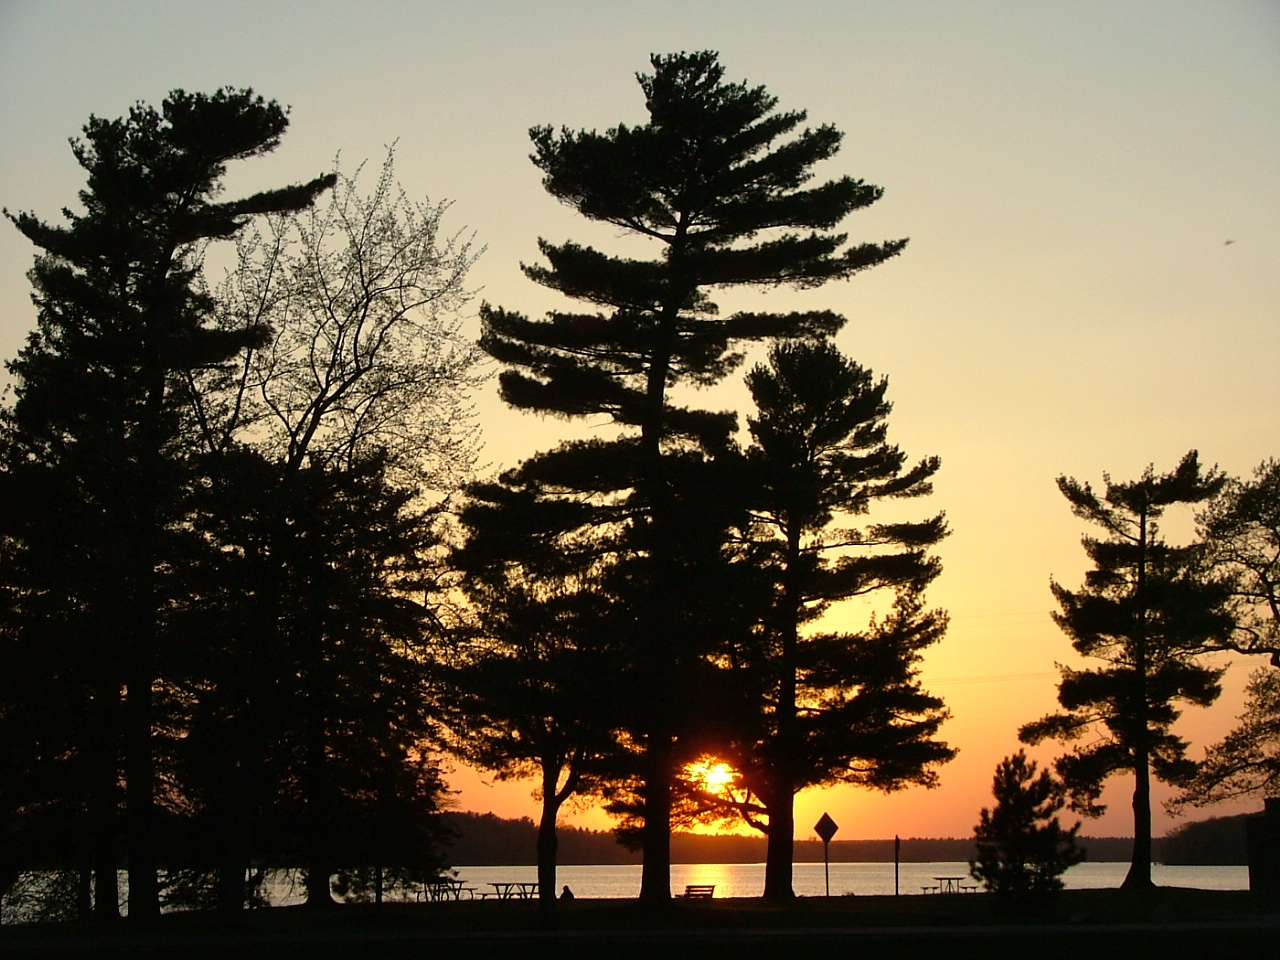 Pine tree in sunset